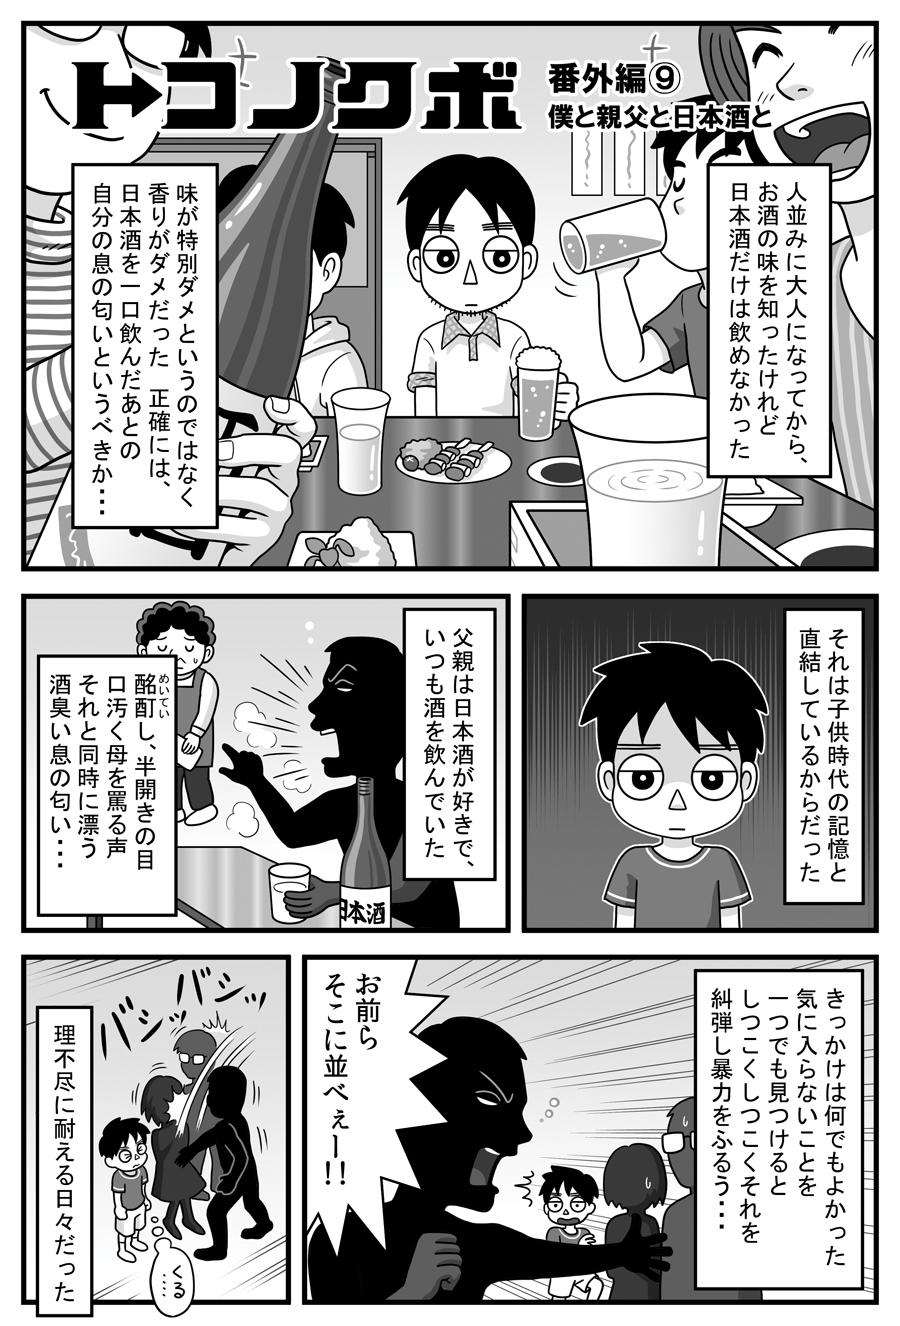 tokonokubo-b09-P01.jpg